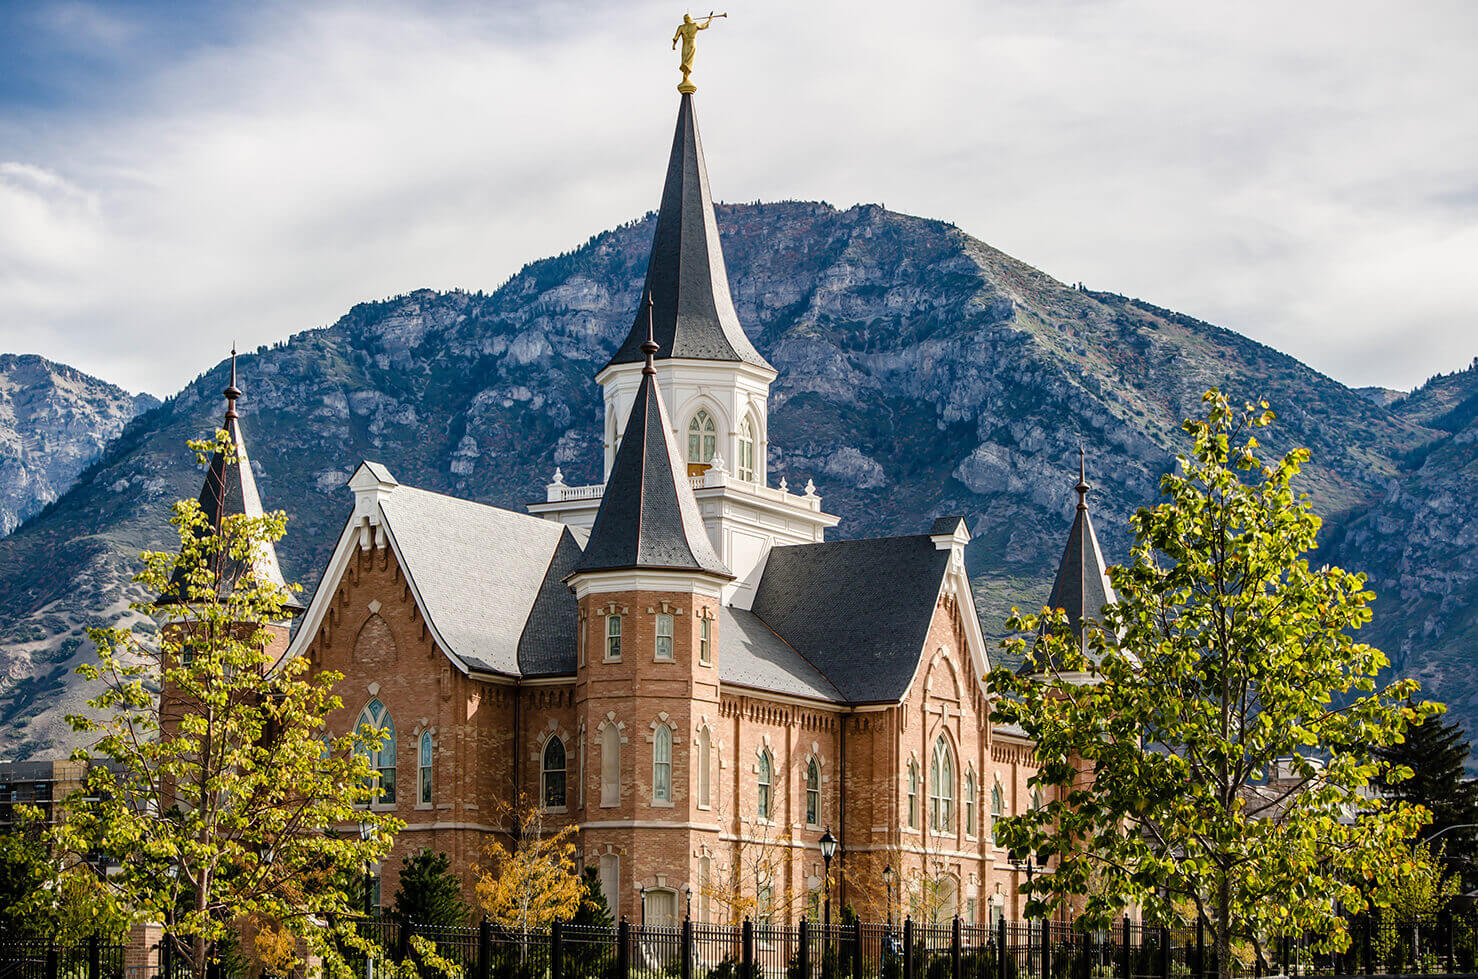 Provo City Center Templeof The Church of Jesus Christ of Latter-day Saints